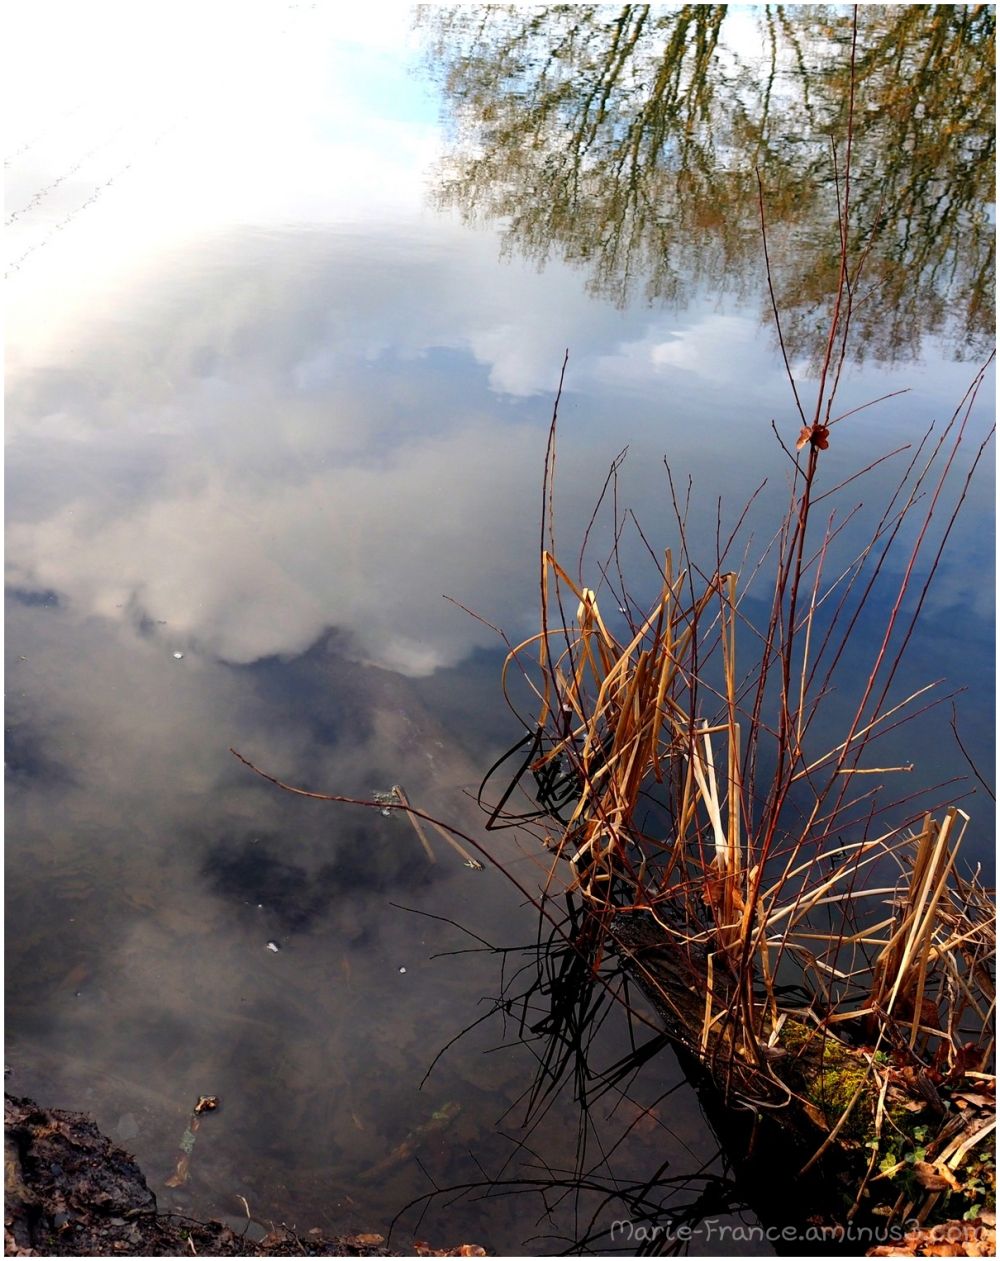 Herbes en bordure d'eau...reflets...